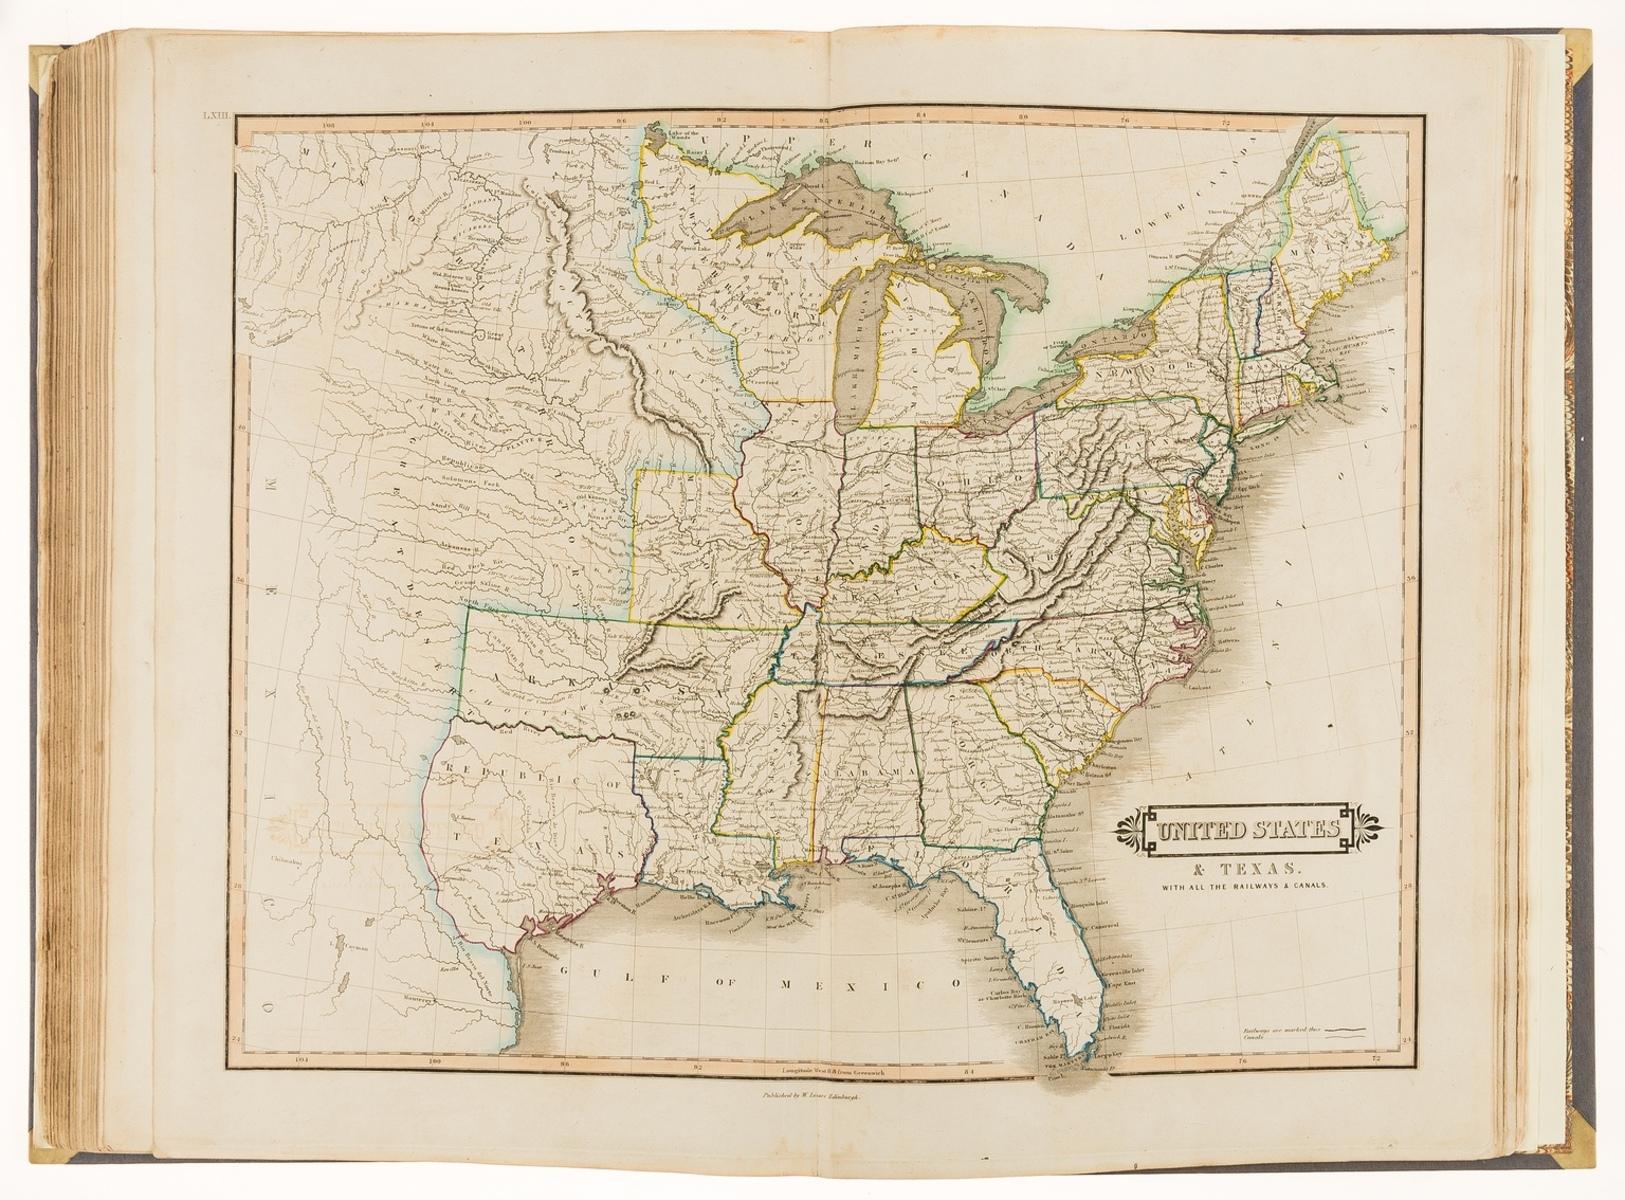 Atlases.- Lizars (Daniel) Lizars' Edinburgh Geographical General Atlas, [1842].